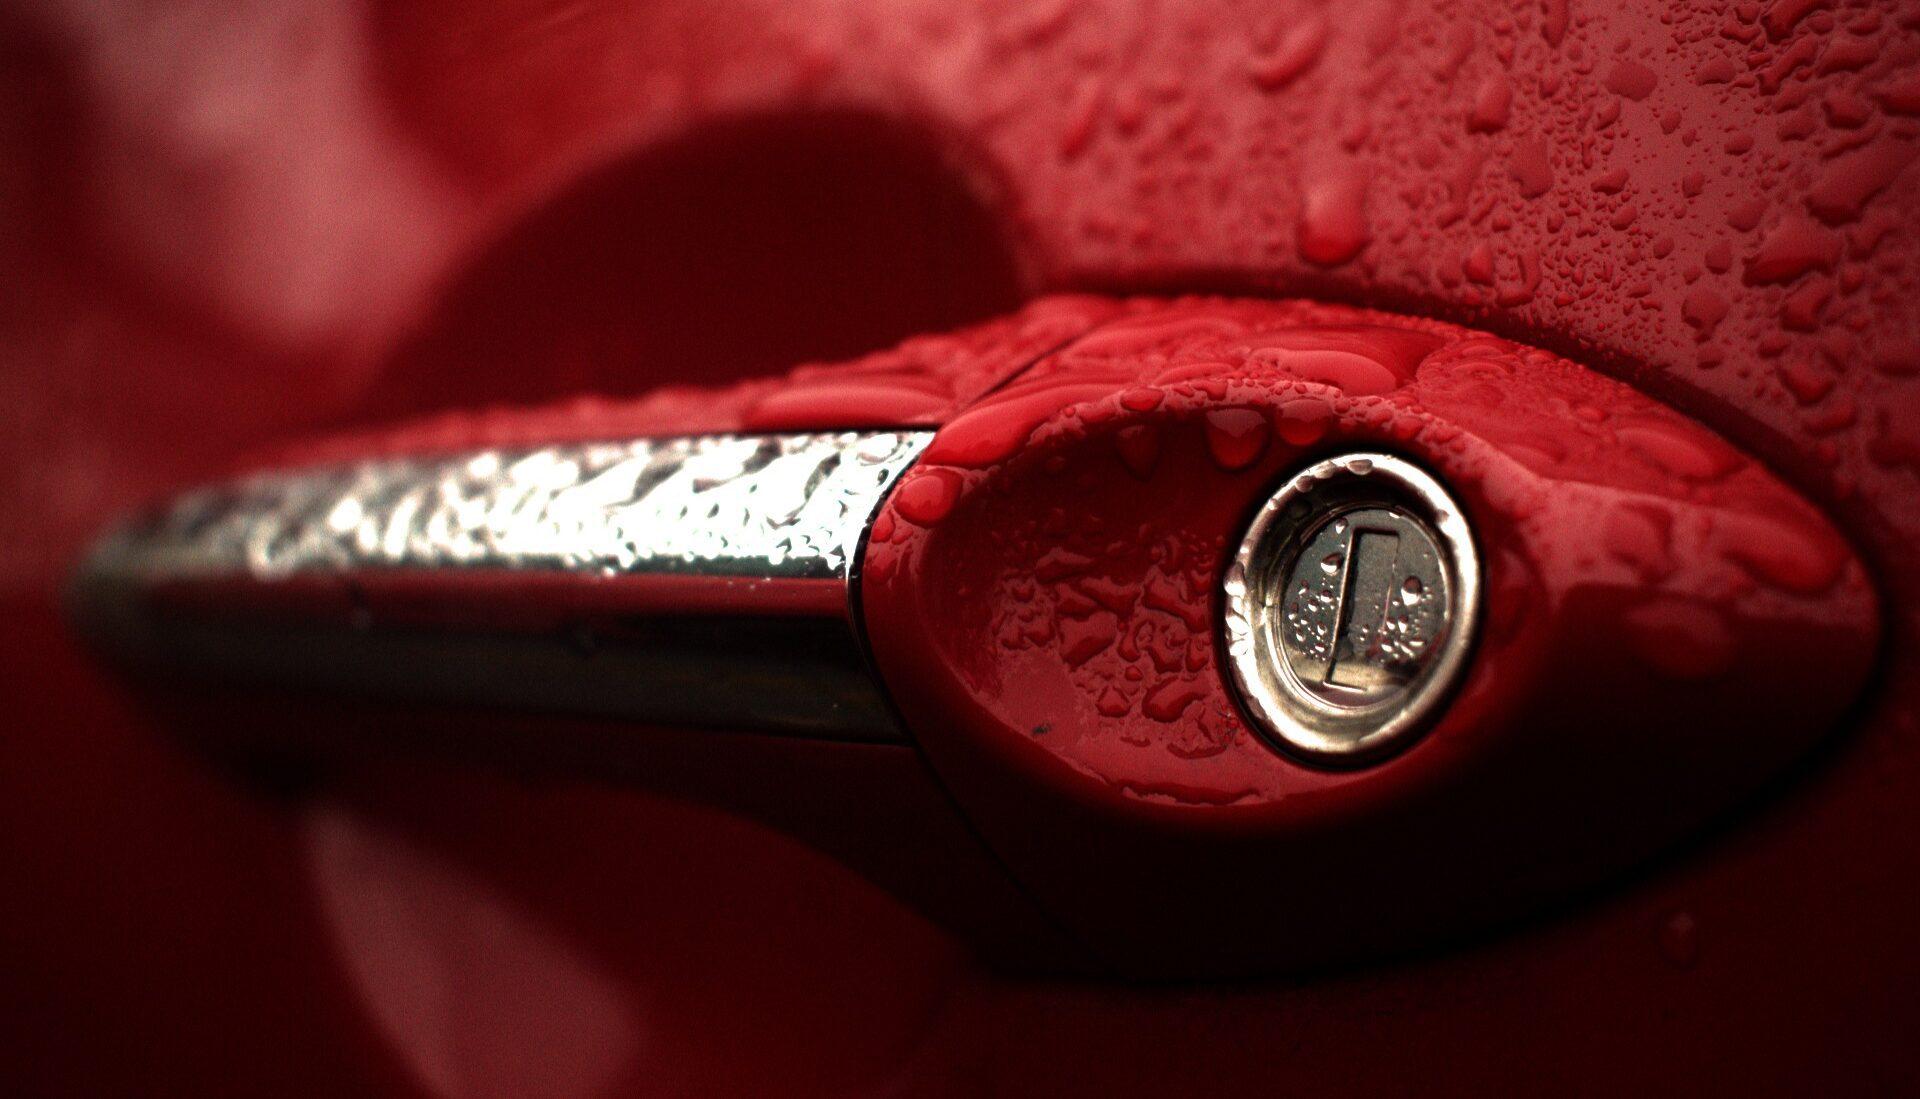 Singing in the Pain, rainy red car door handle